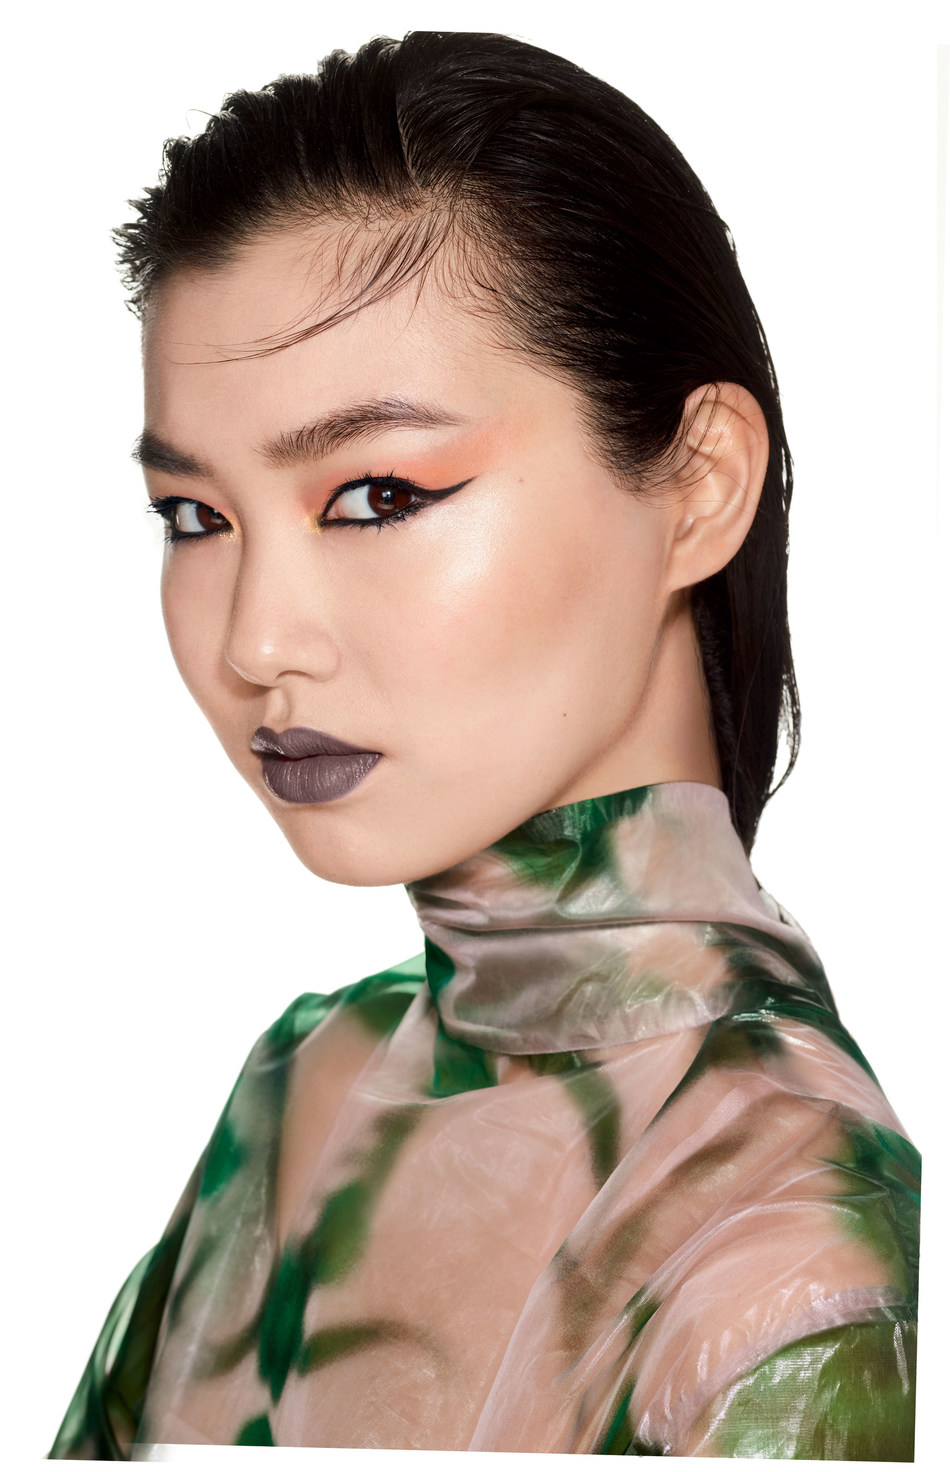 Estelle Chen, Maybelline New York Global Spokesmodel